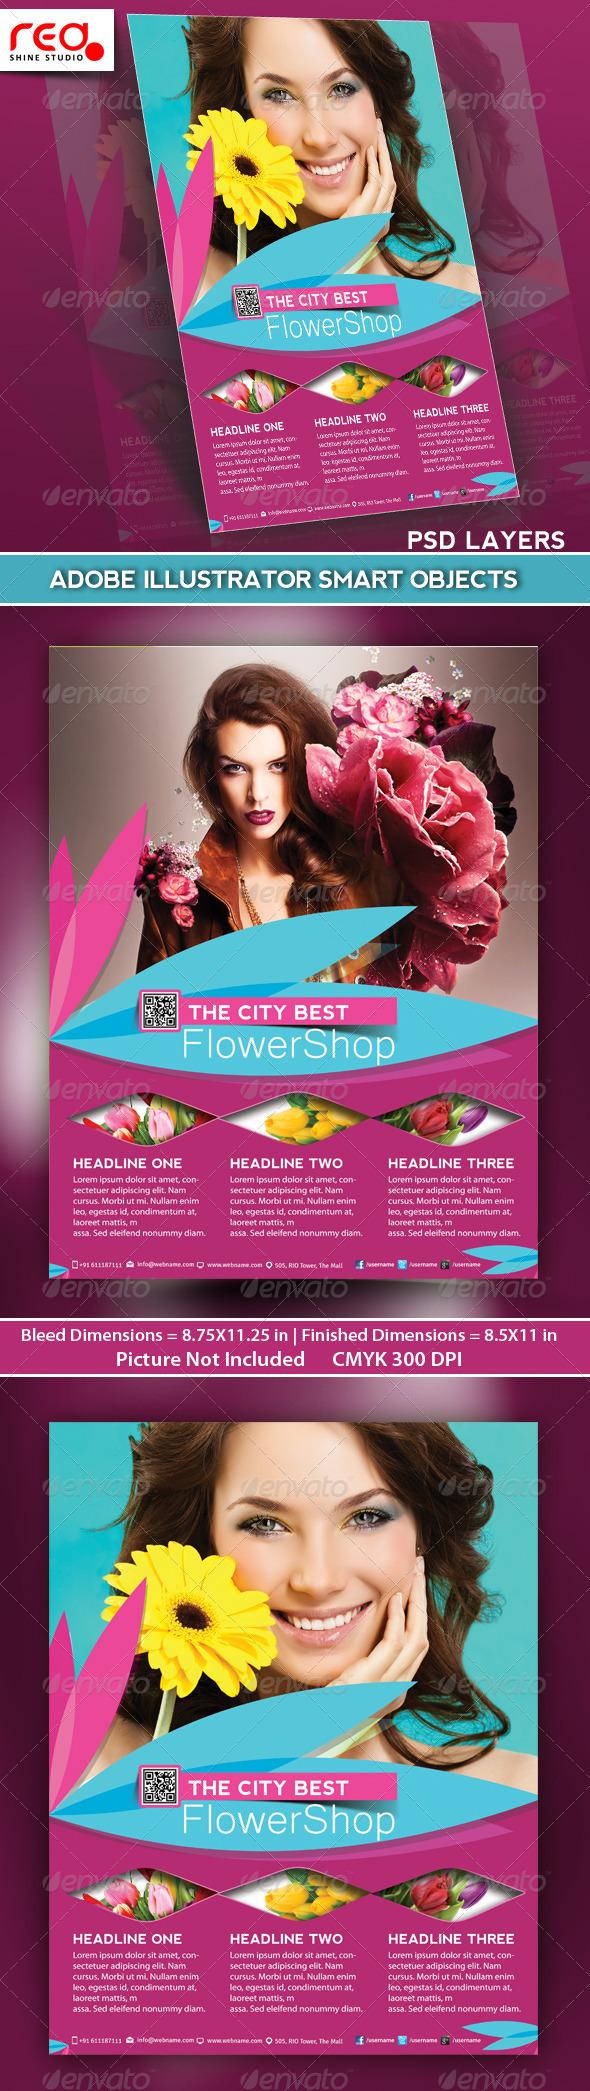 Flower Shop Flyer, Poster & Magazine Template - Commerce Flyers